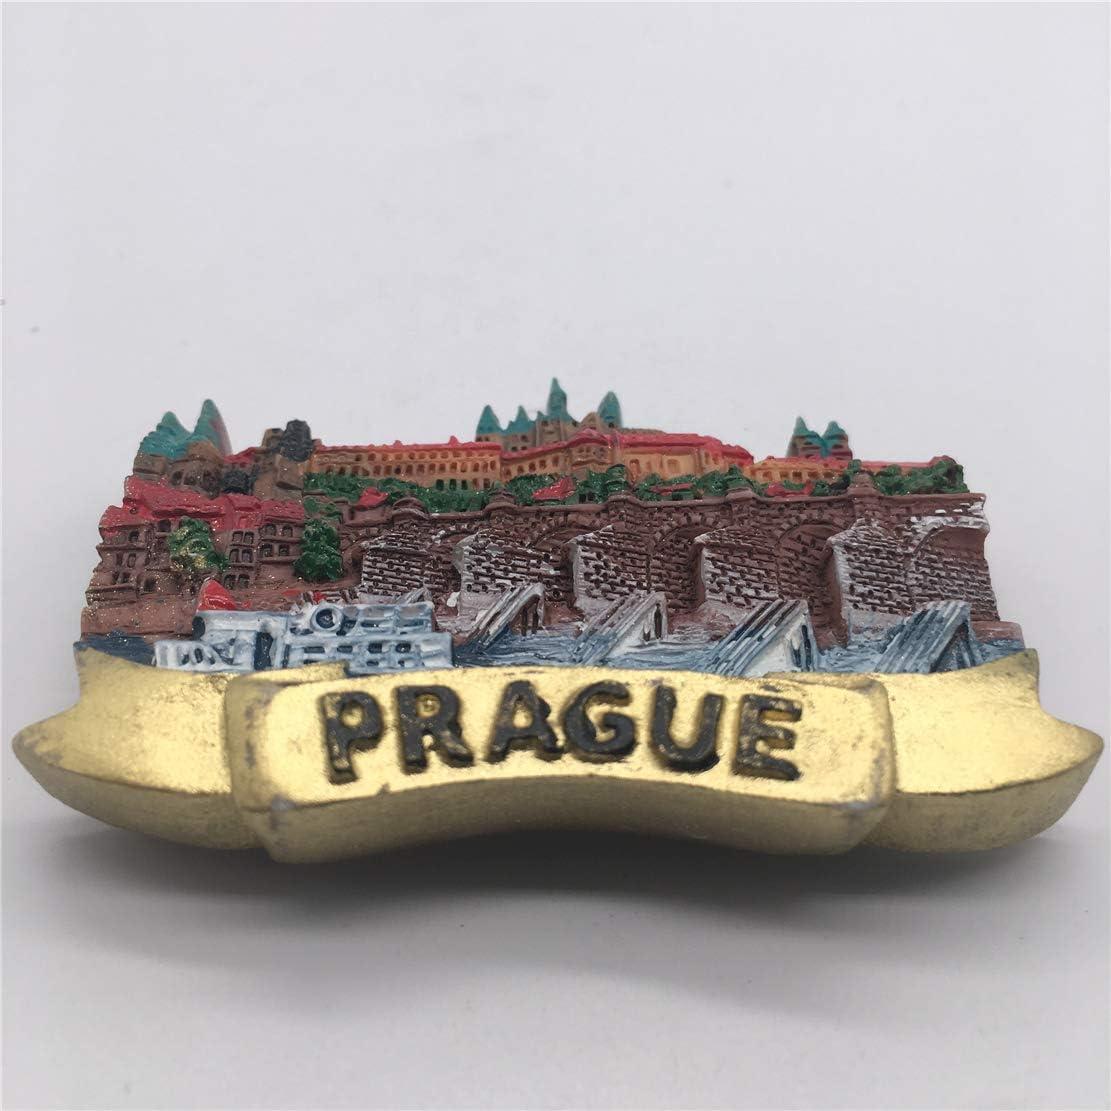 Fridge Magnet City Hall Praga Repubblica Ceca 3D Resina Handmade Craft Tourist Travel Citt/à Souvenir Collection Lettera Frigorifero Sticker